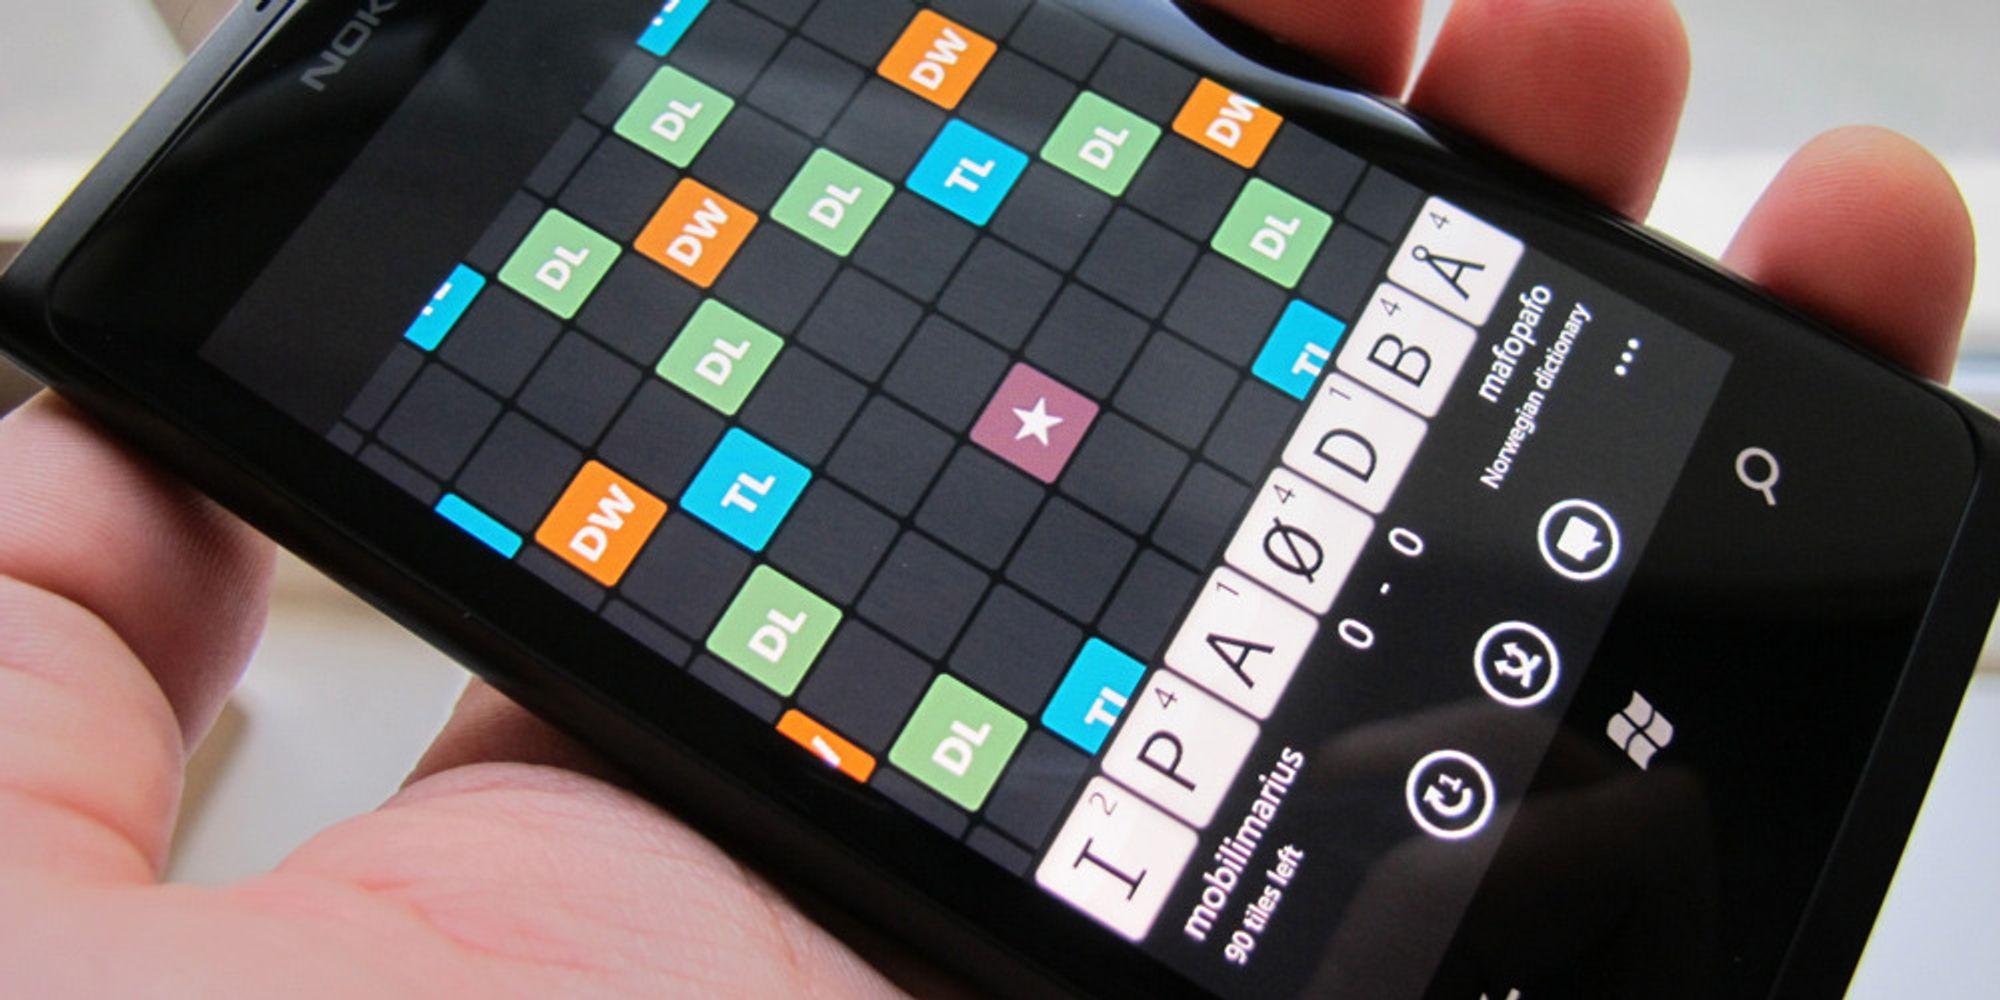 Nå får du Wordfeud på Windows Phone